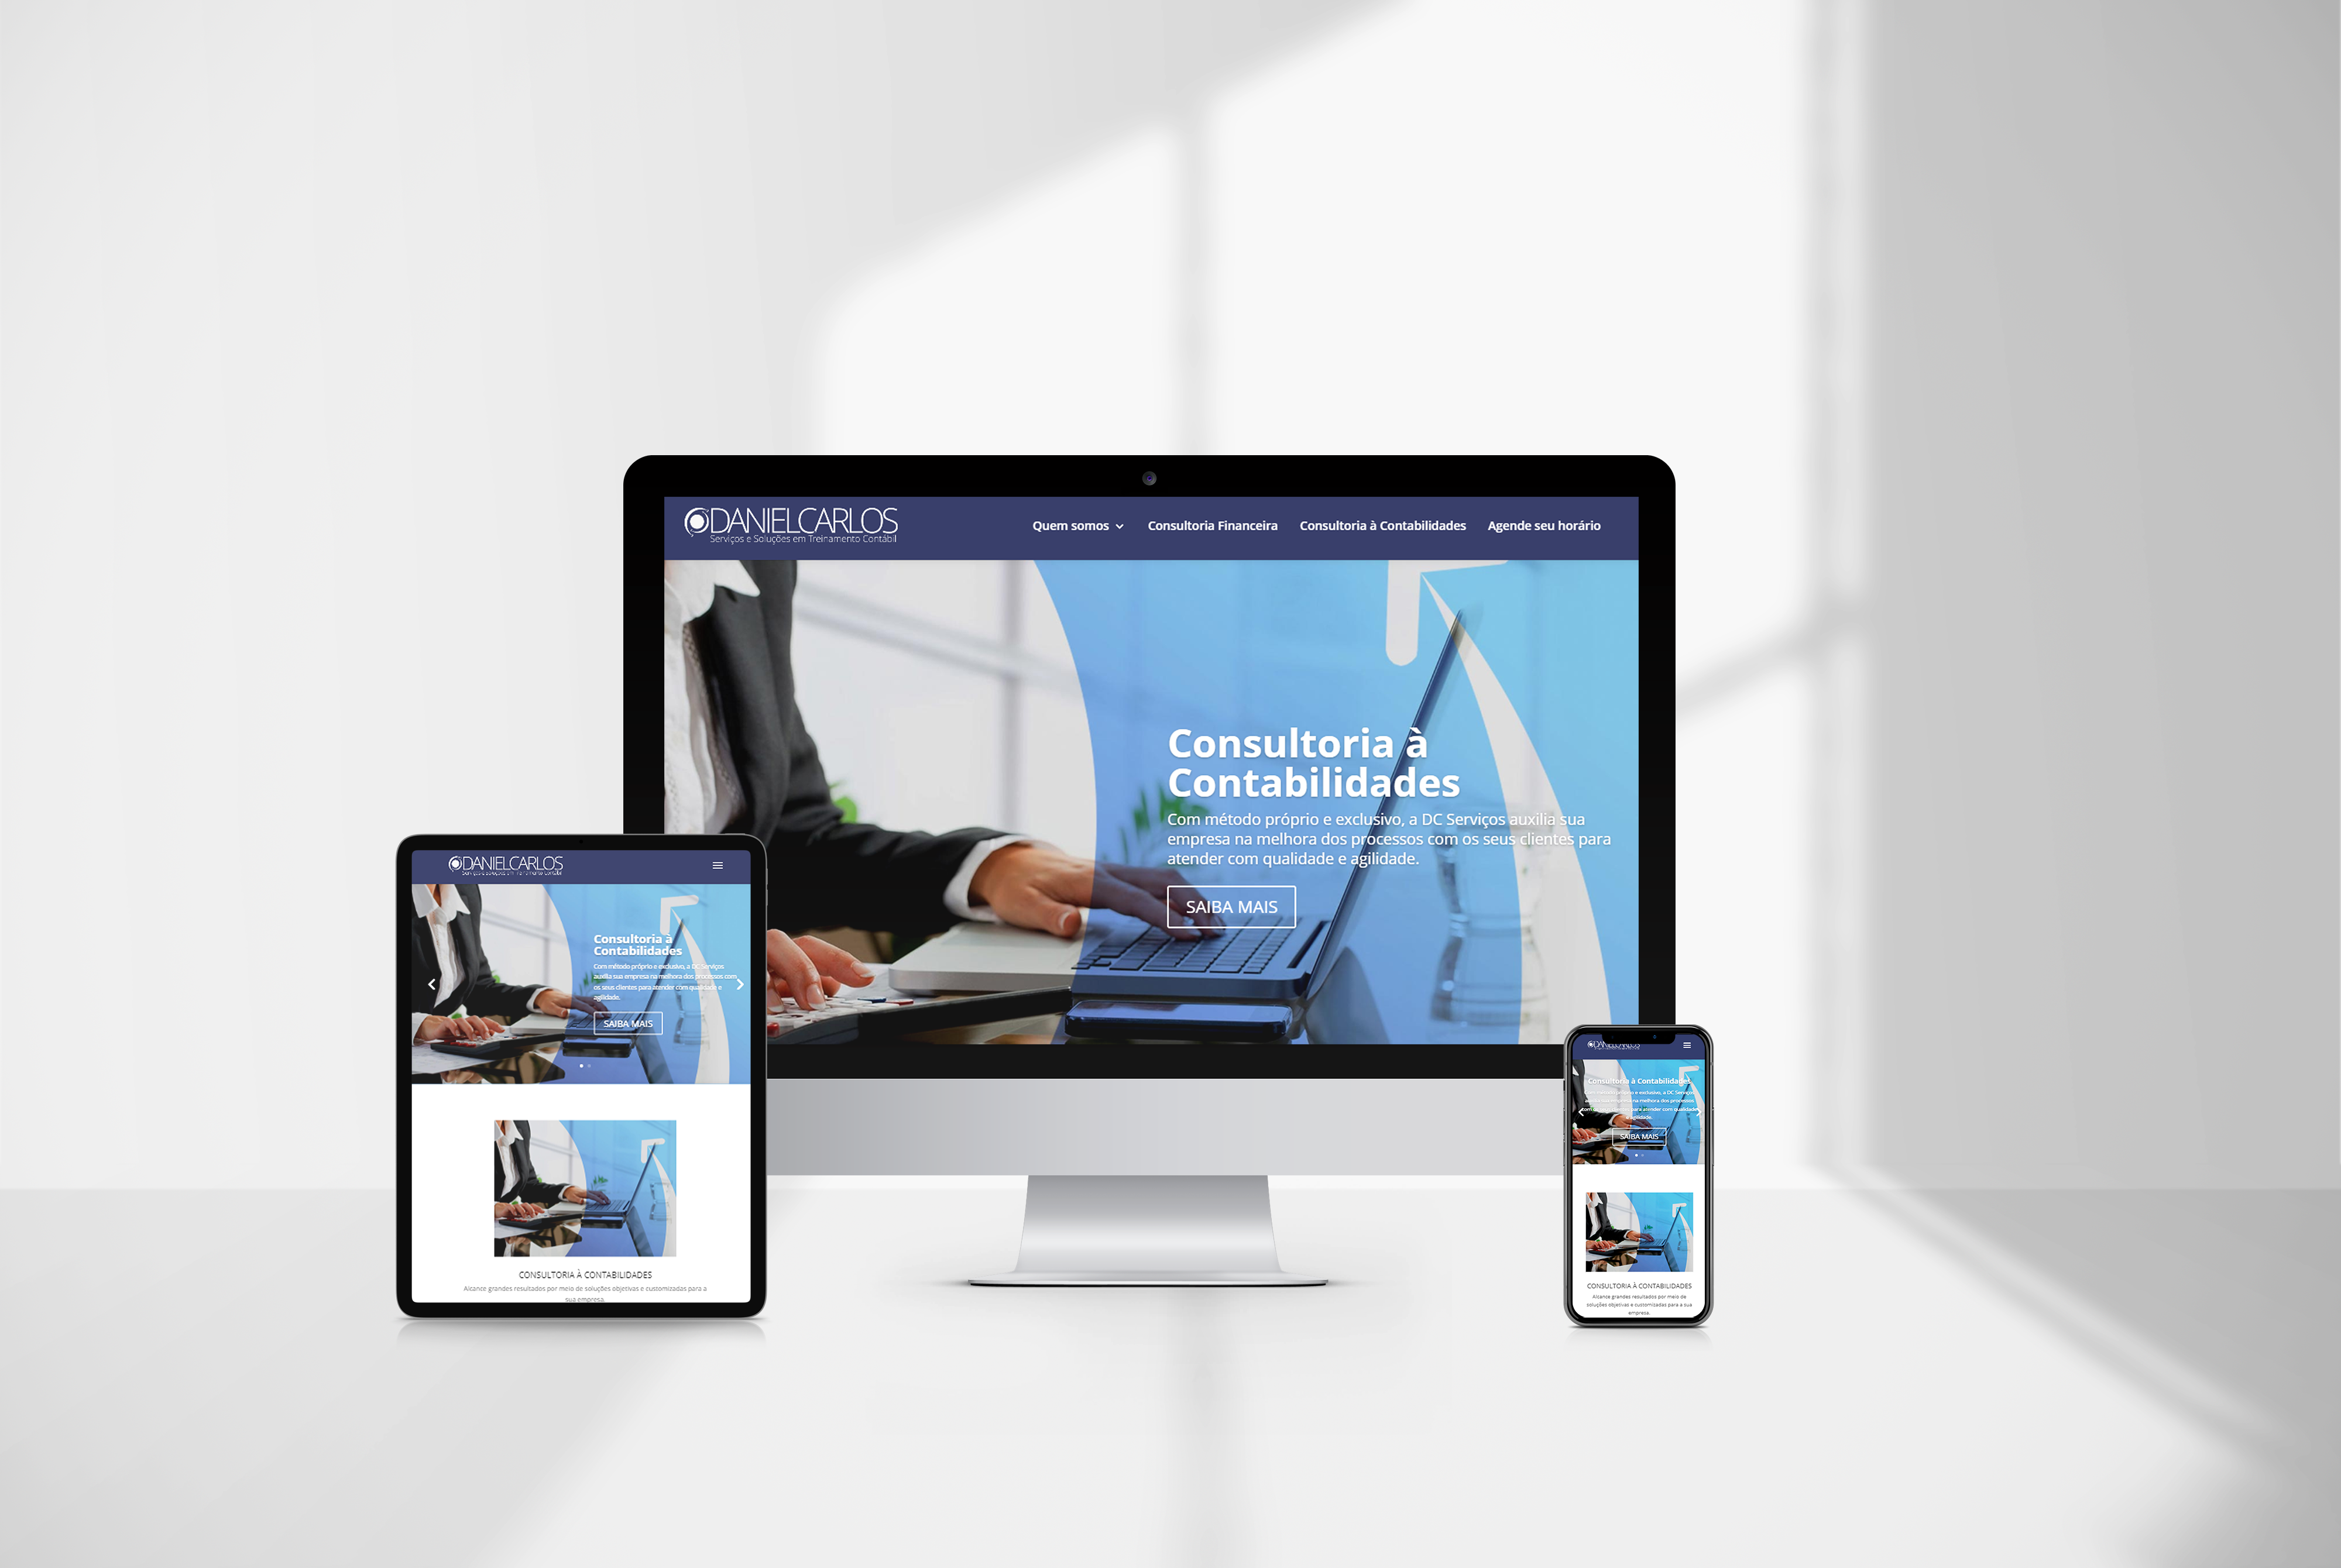 criacao de sites daniel carlos - agencia de marketing digital casanova digital